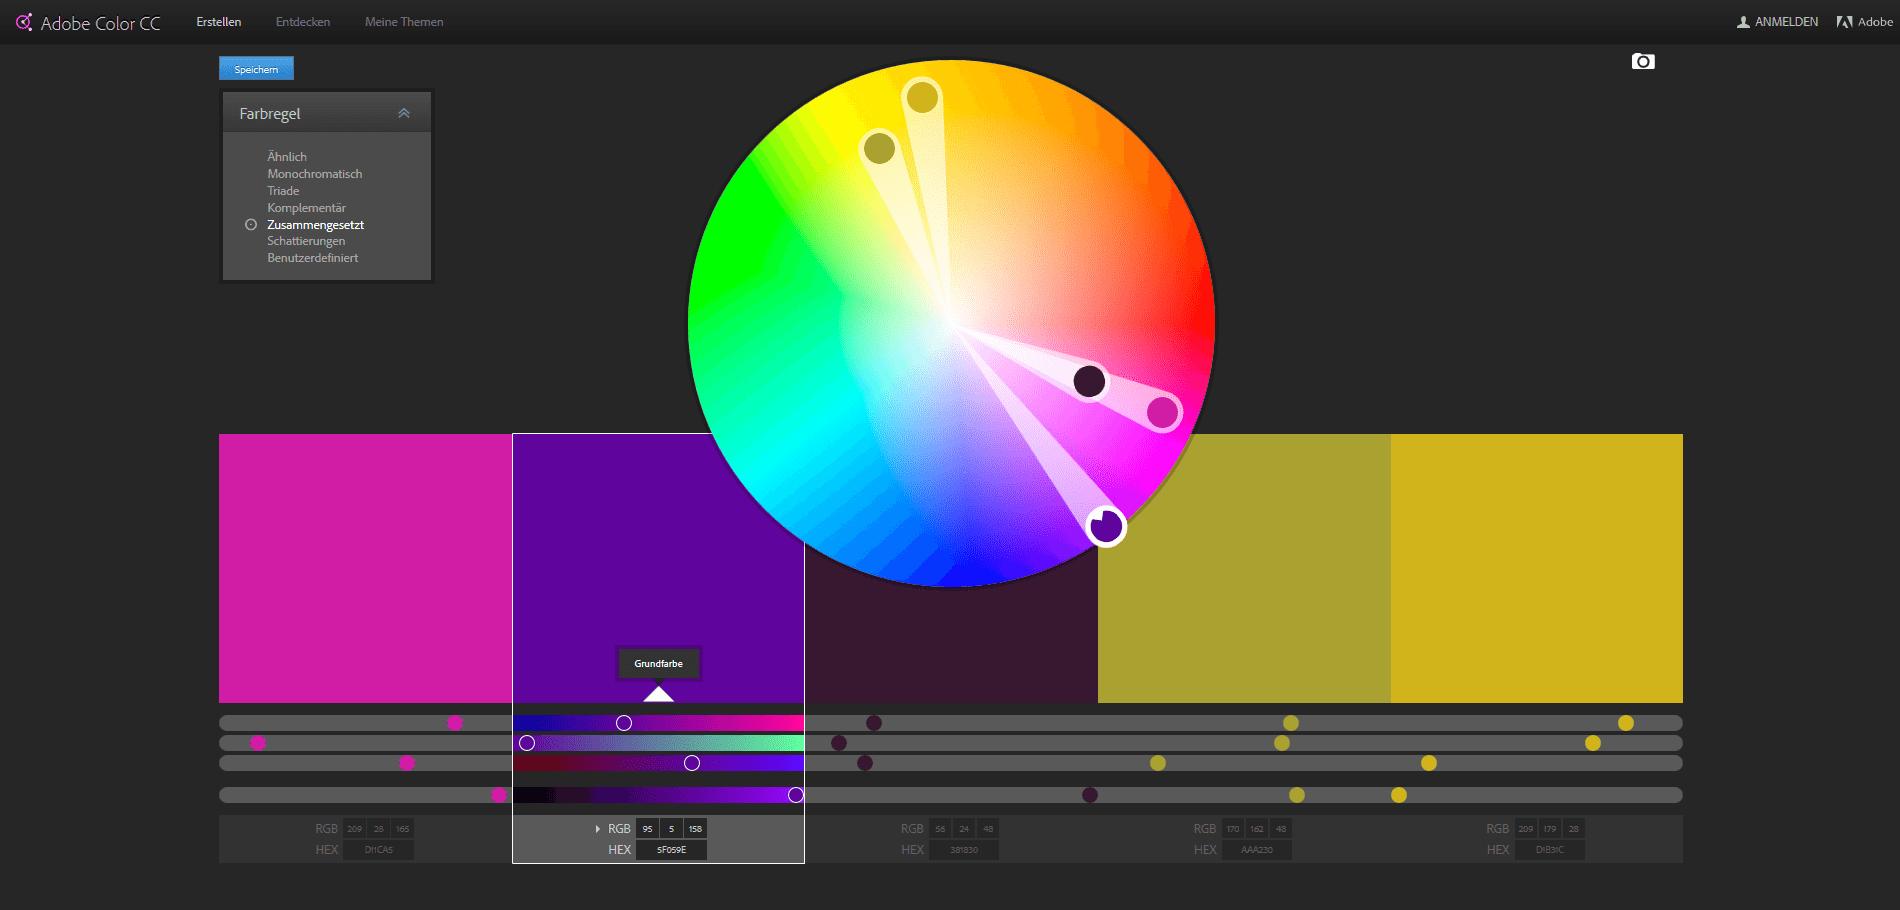 Farbkombination mit Adobe Color CC